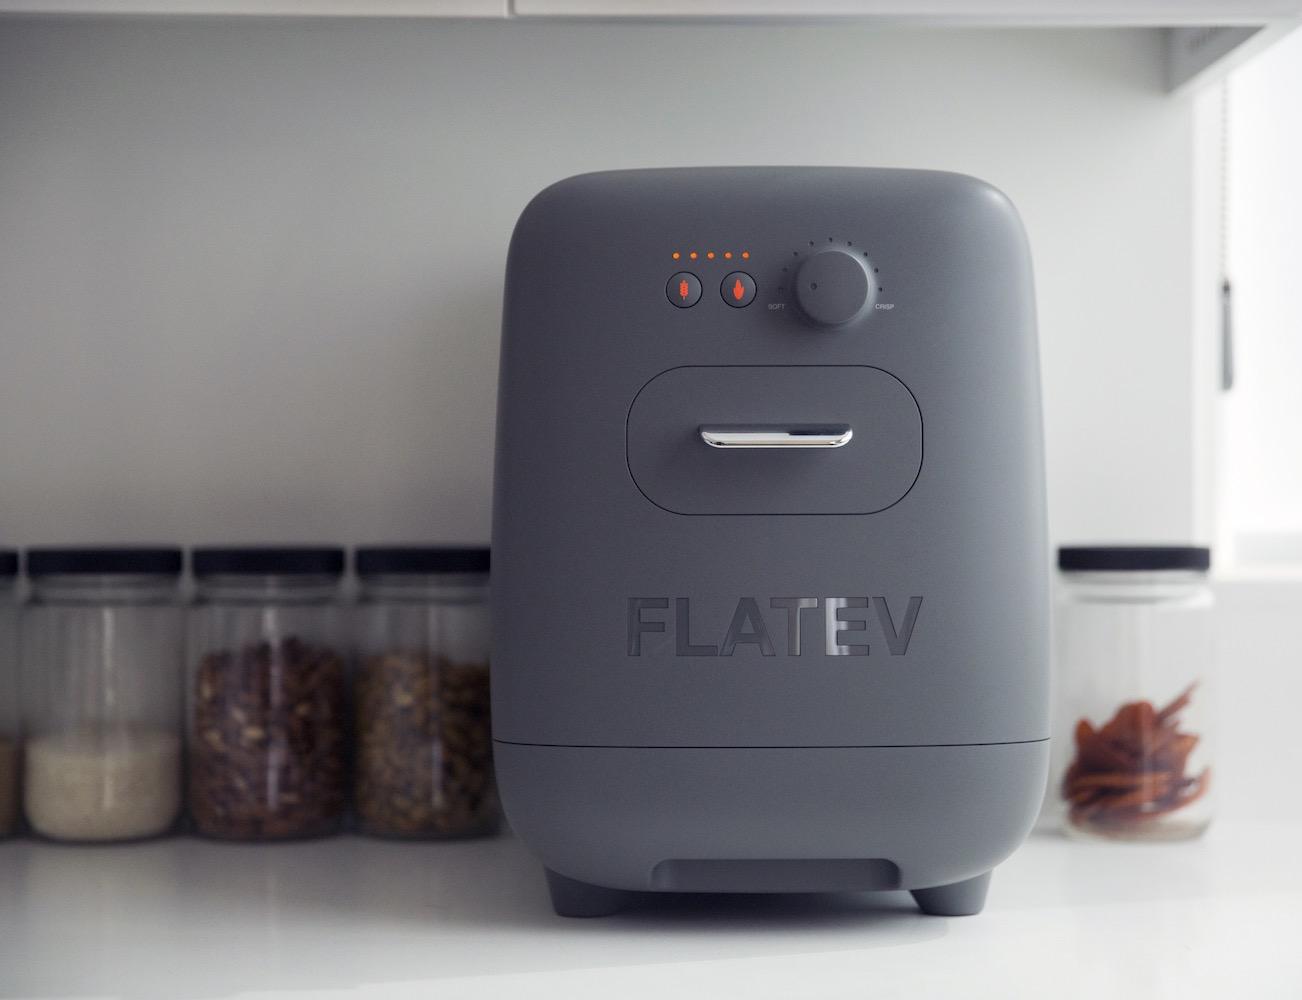 flatev – The Artisan Tortilla Maker